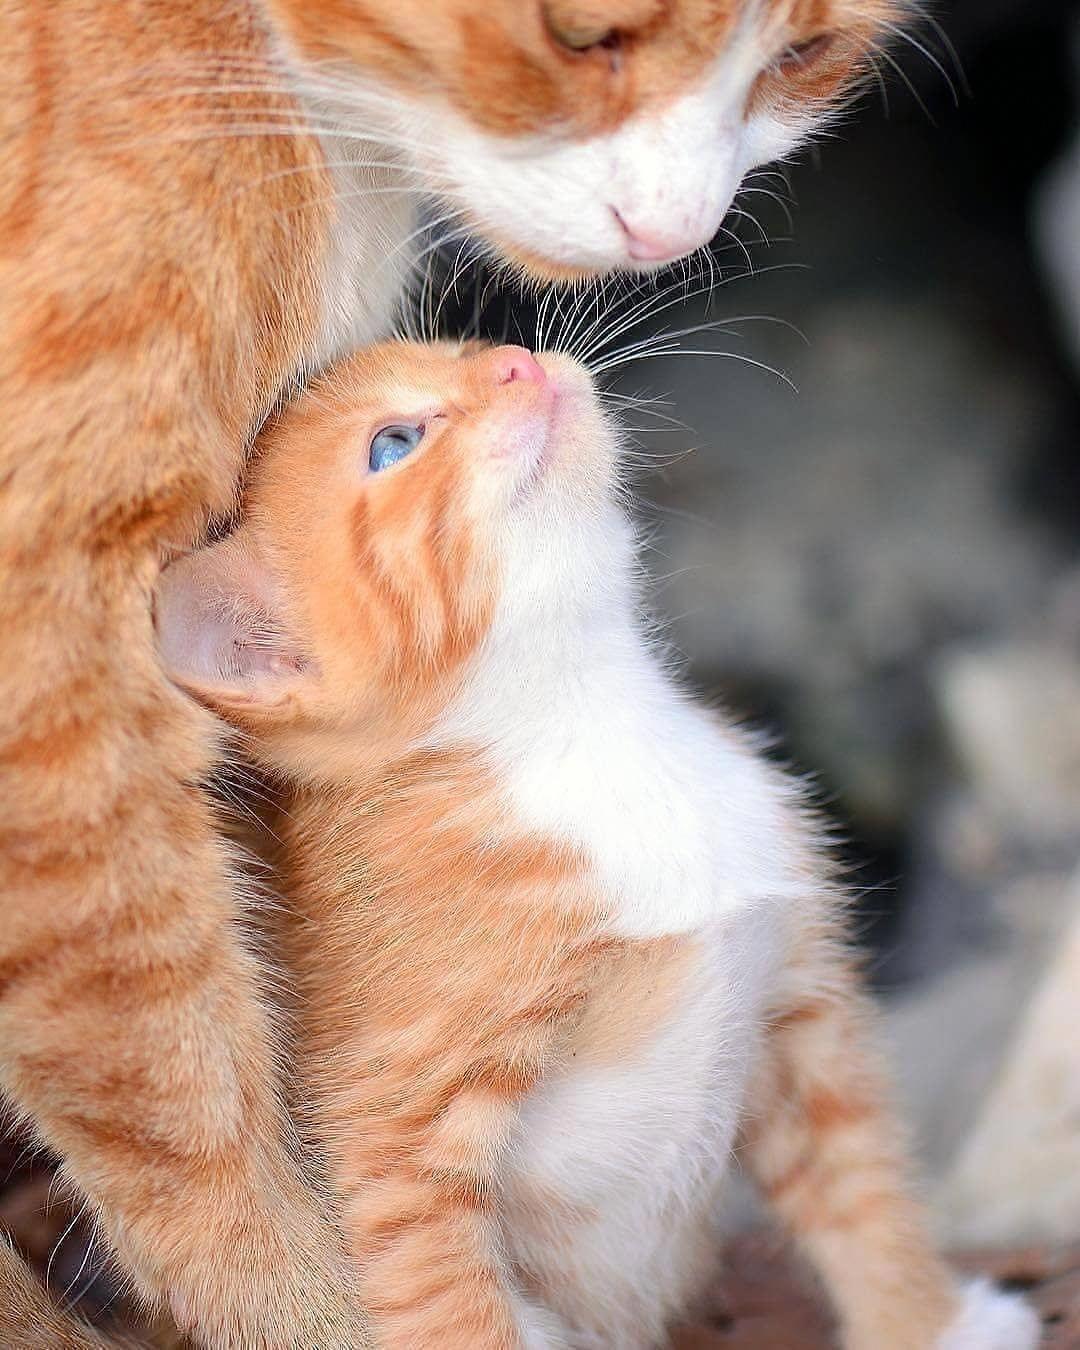 b9695461babf1f5874c180edc956a3bd - How To Get A Wild Kitten To Trust You